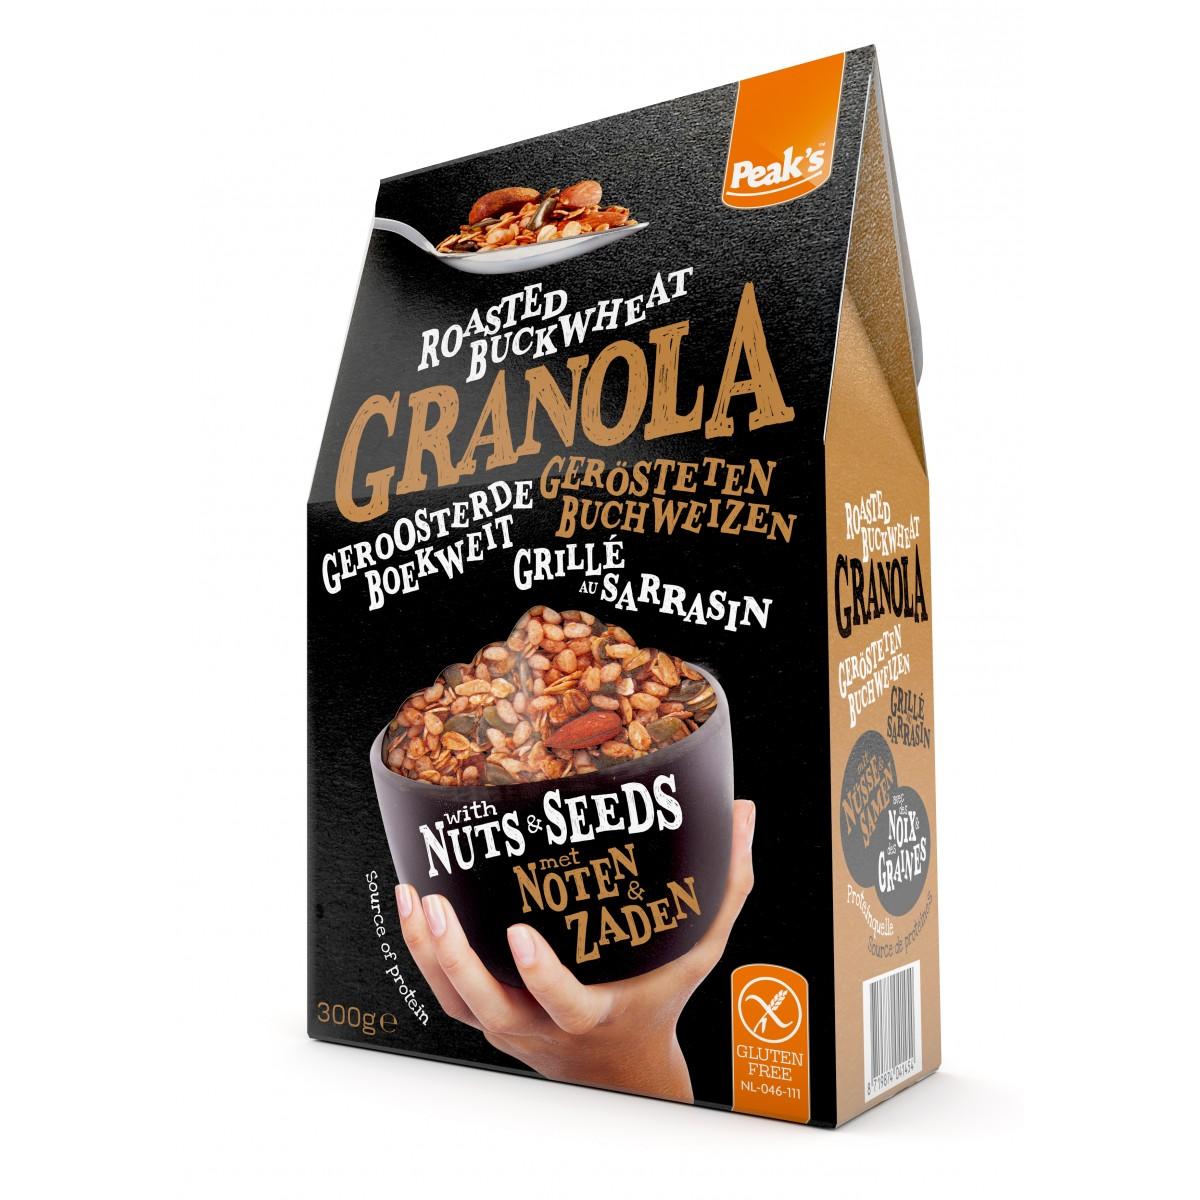 Granola Roasted Boekweit Noten & Zaden